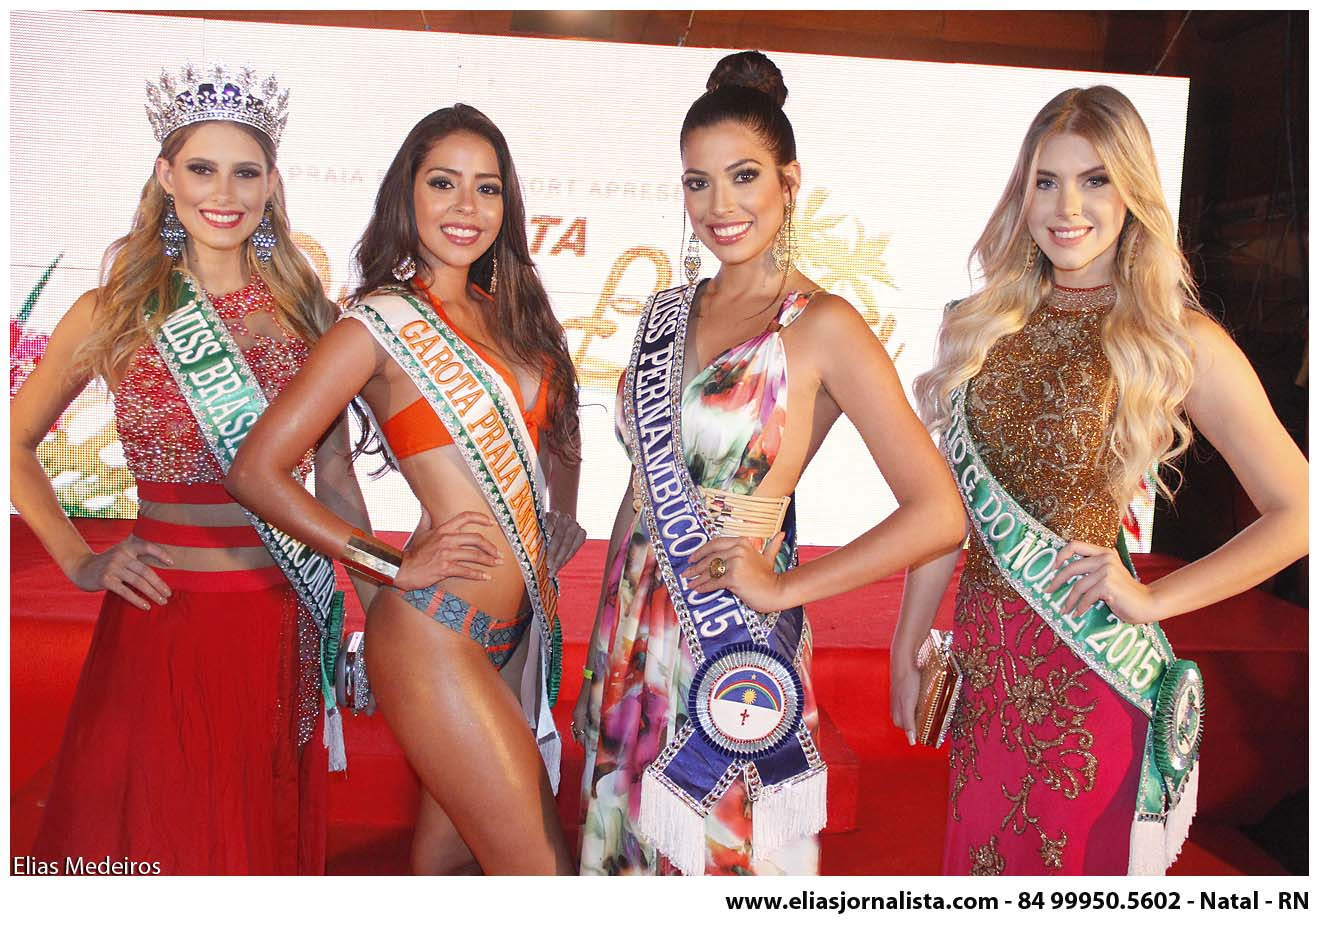 manoela alves, miss brasil internacional 2016. Yfxsbfpg